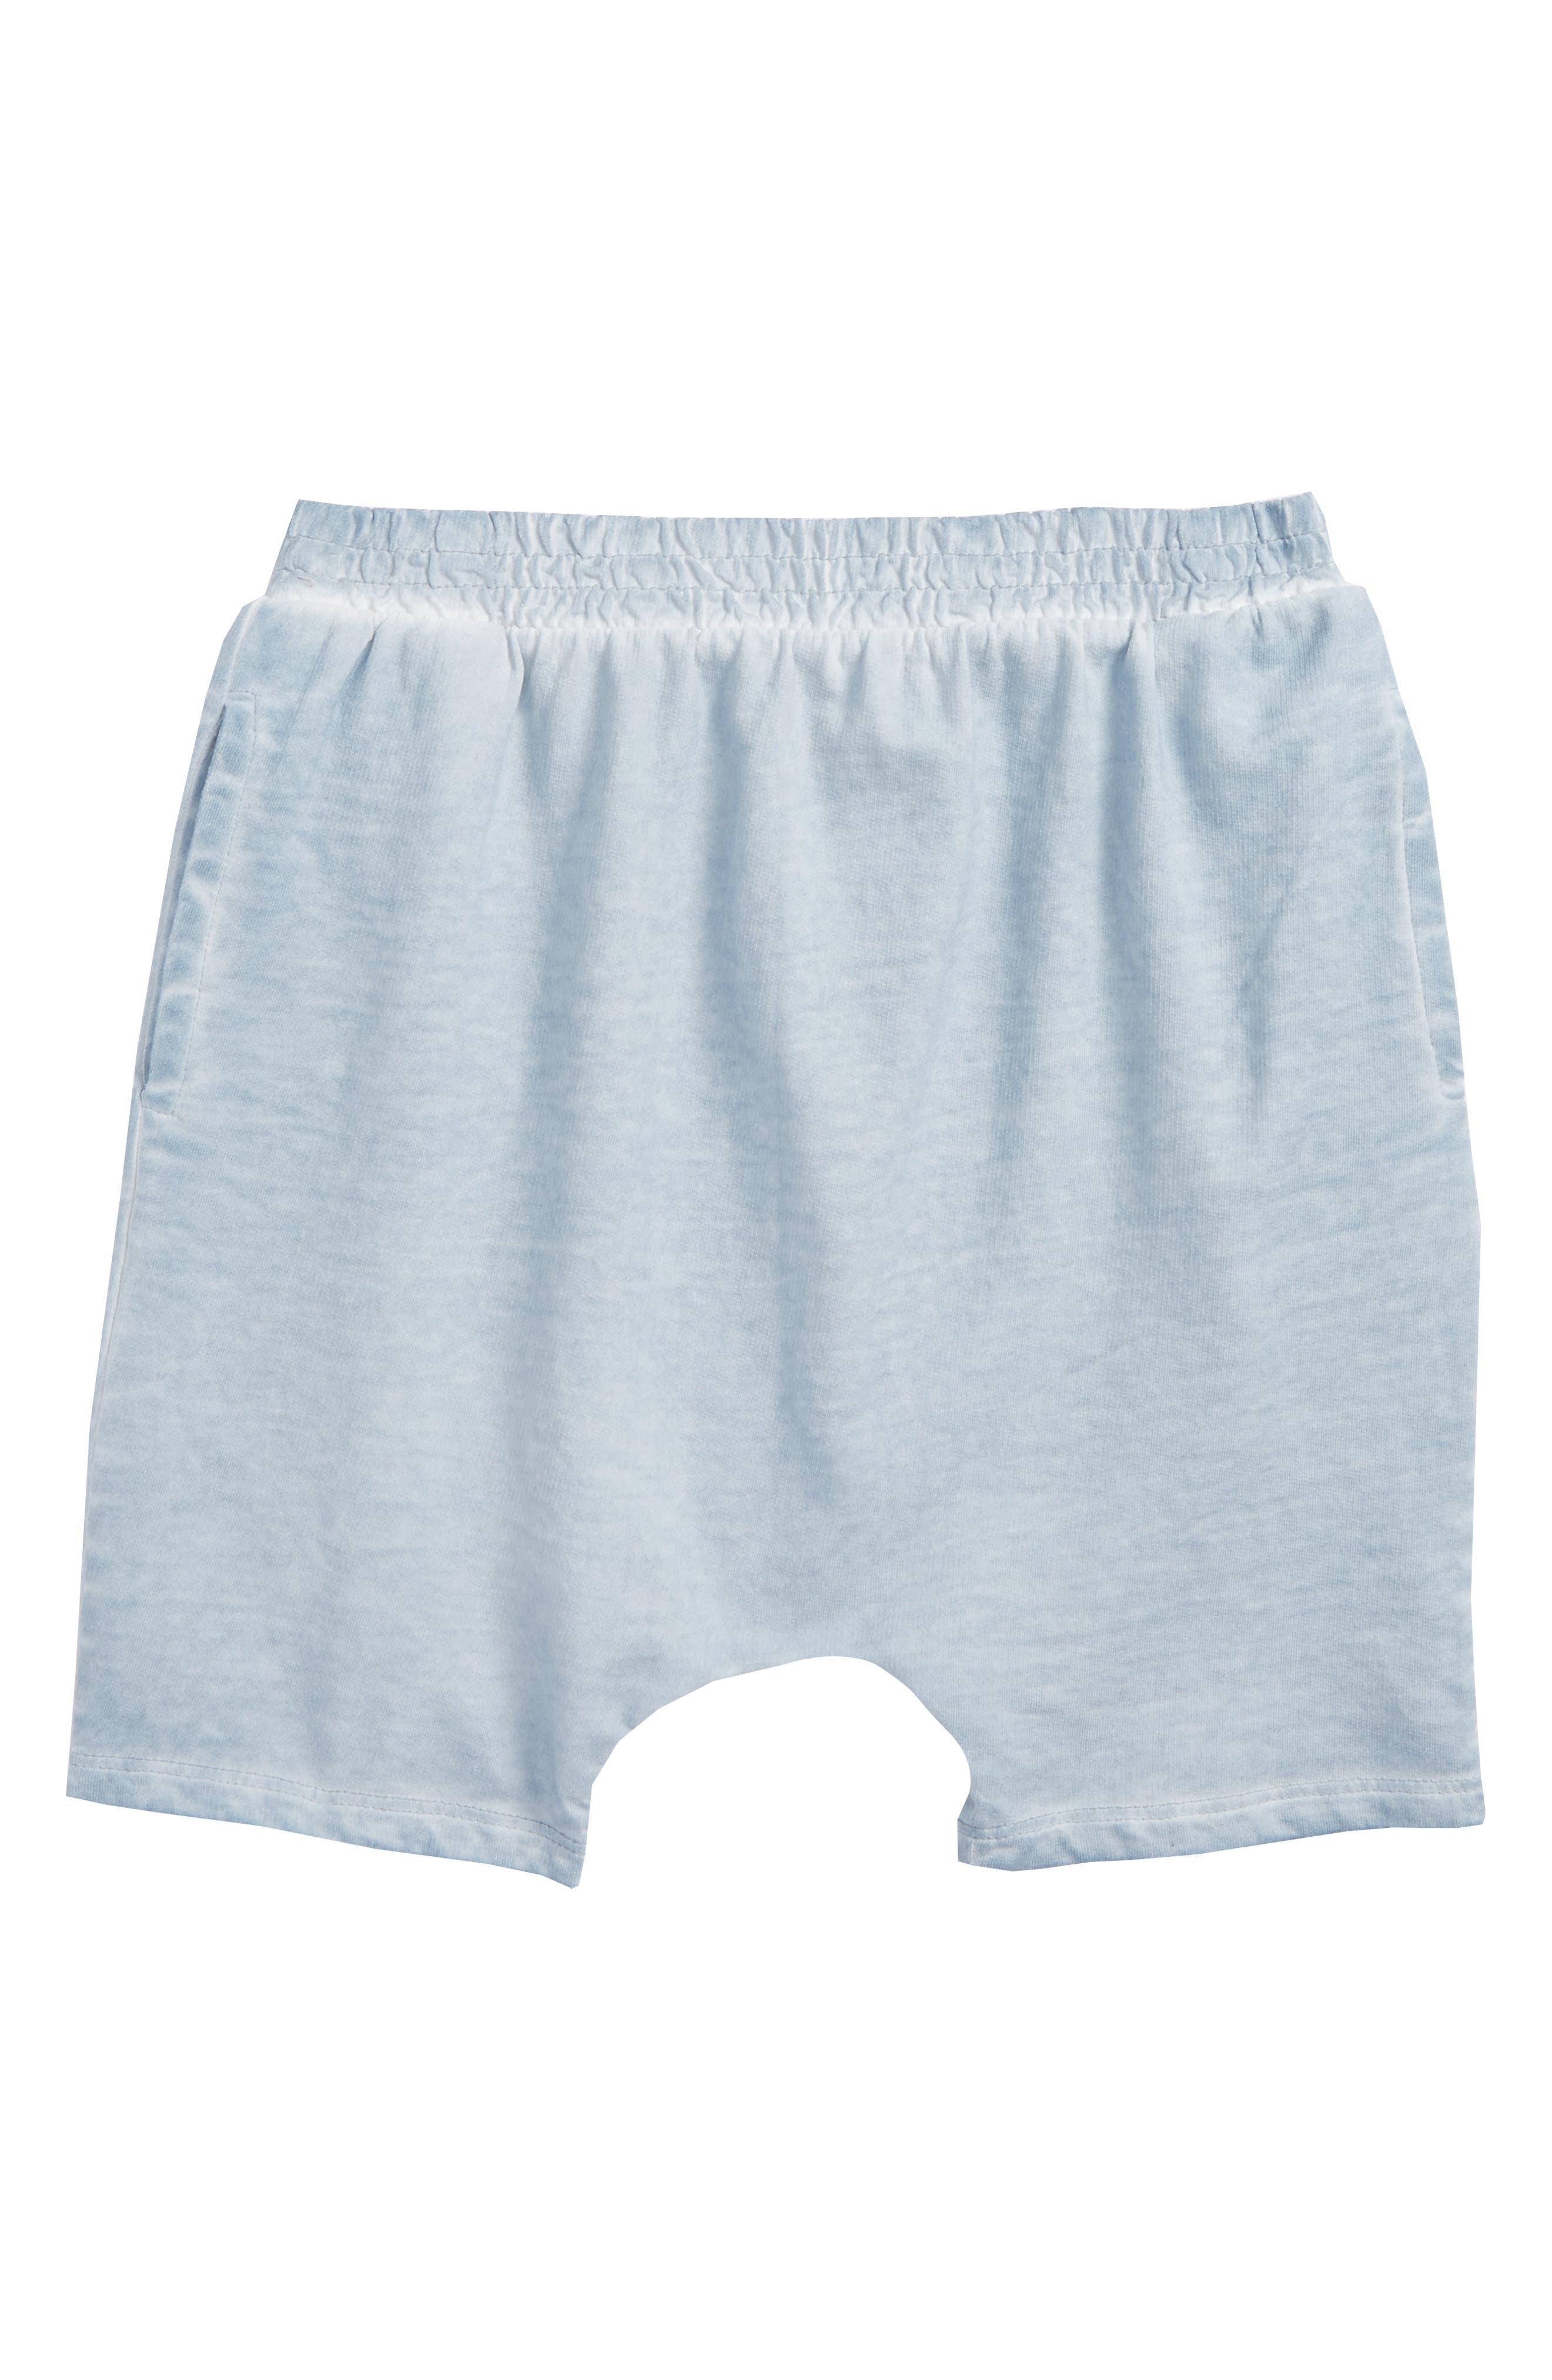 Cotton Shorts,                             Main thumbnail 1, color,                             450